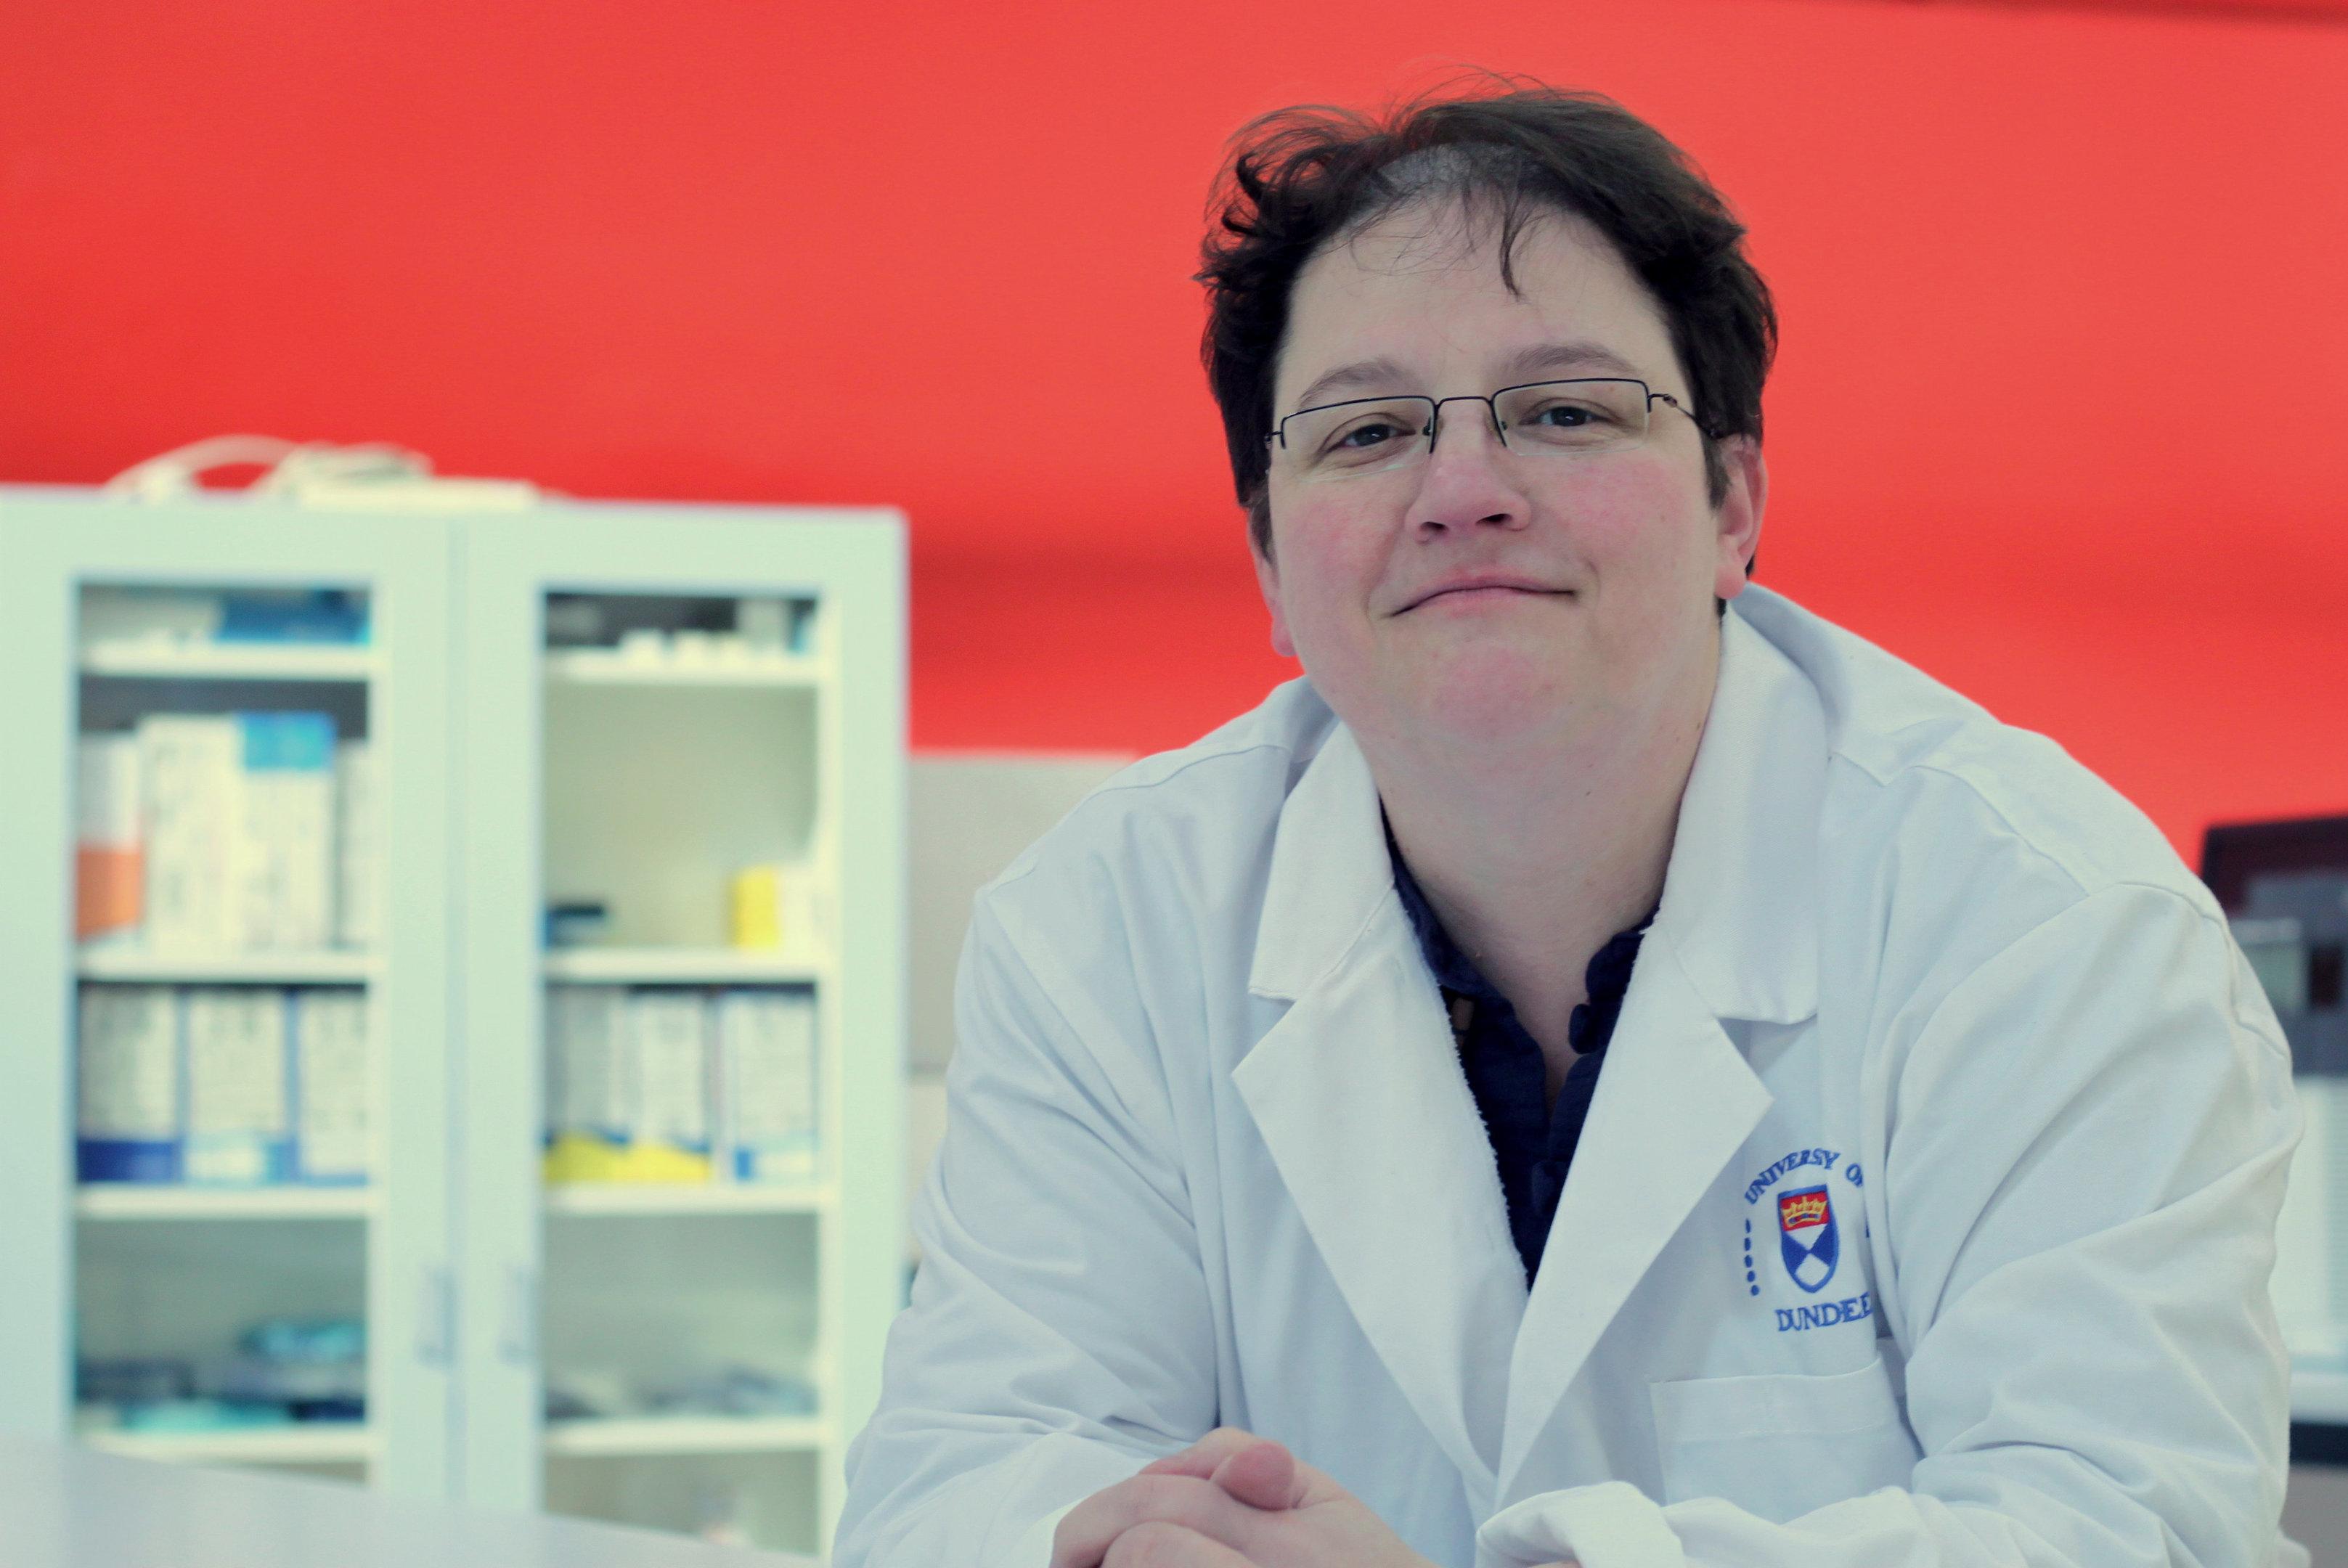 Professor Niamh Nic Daeid